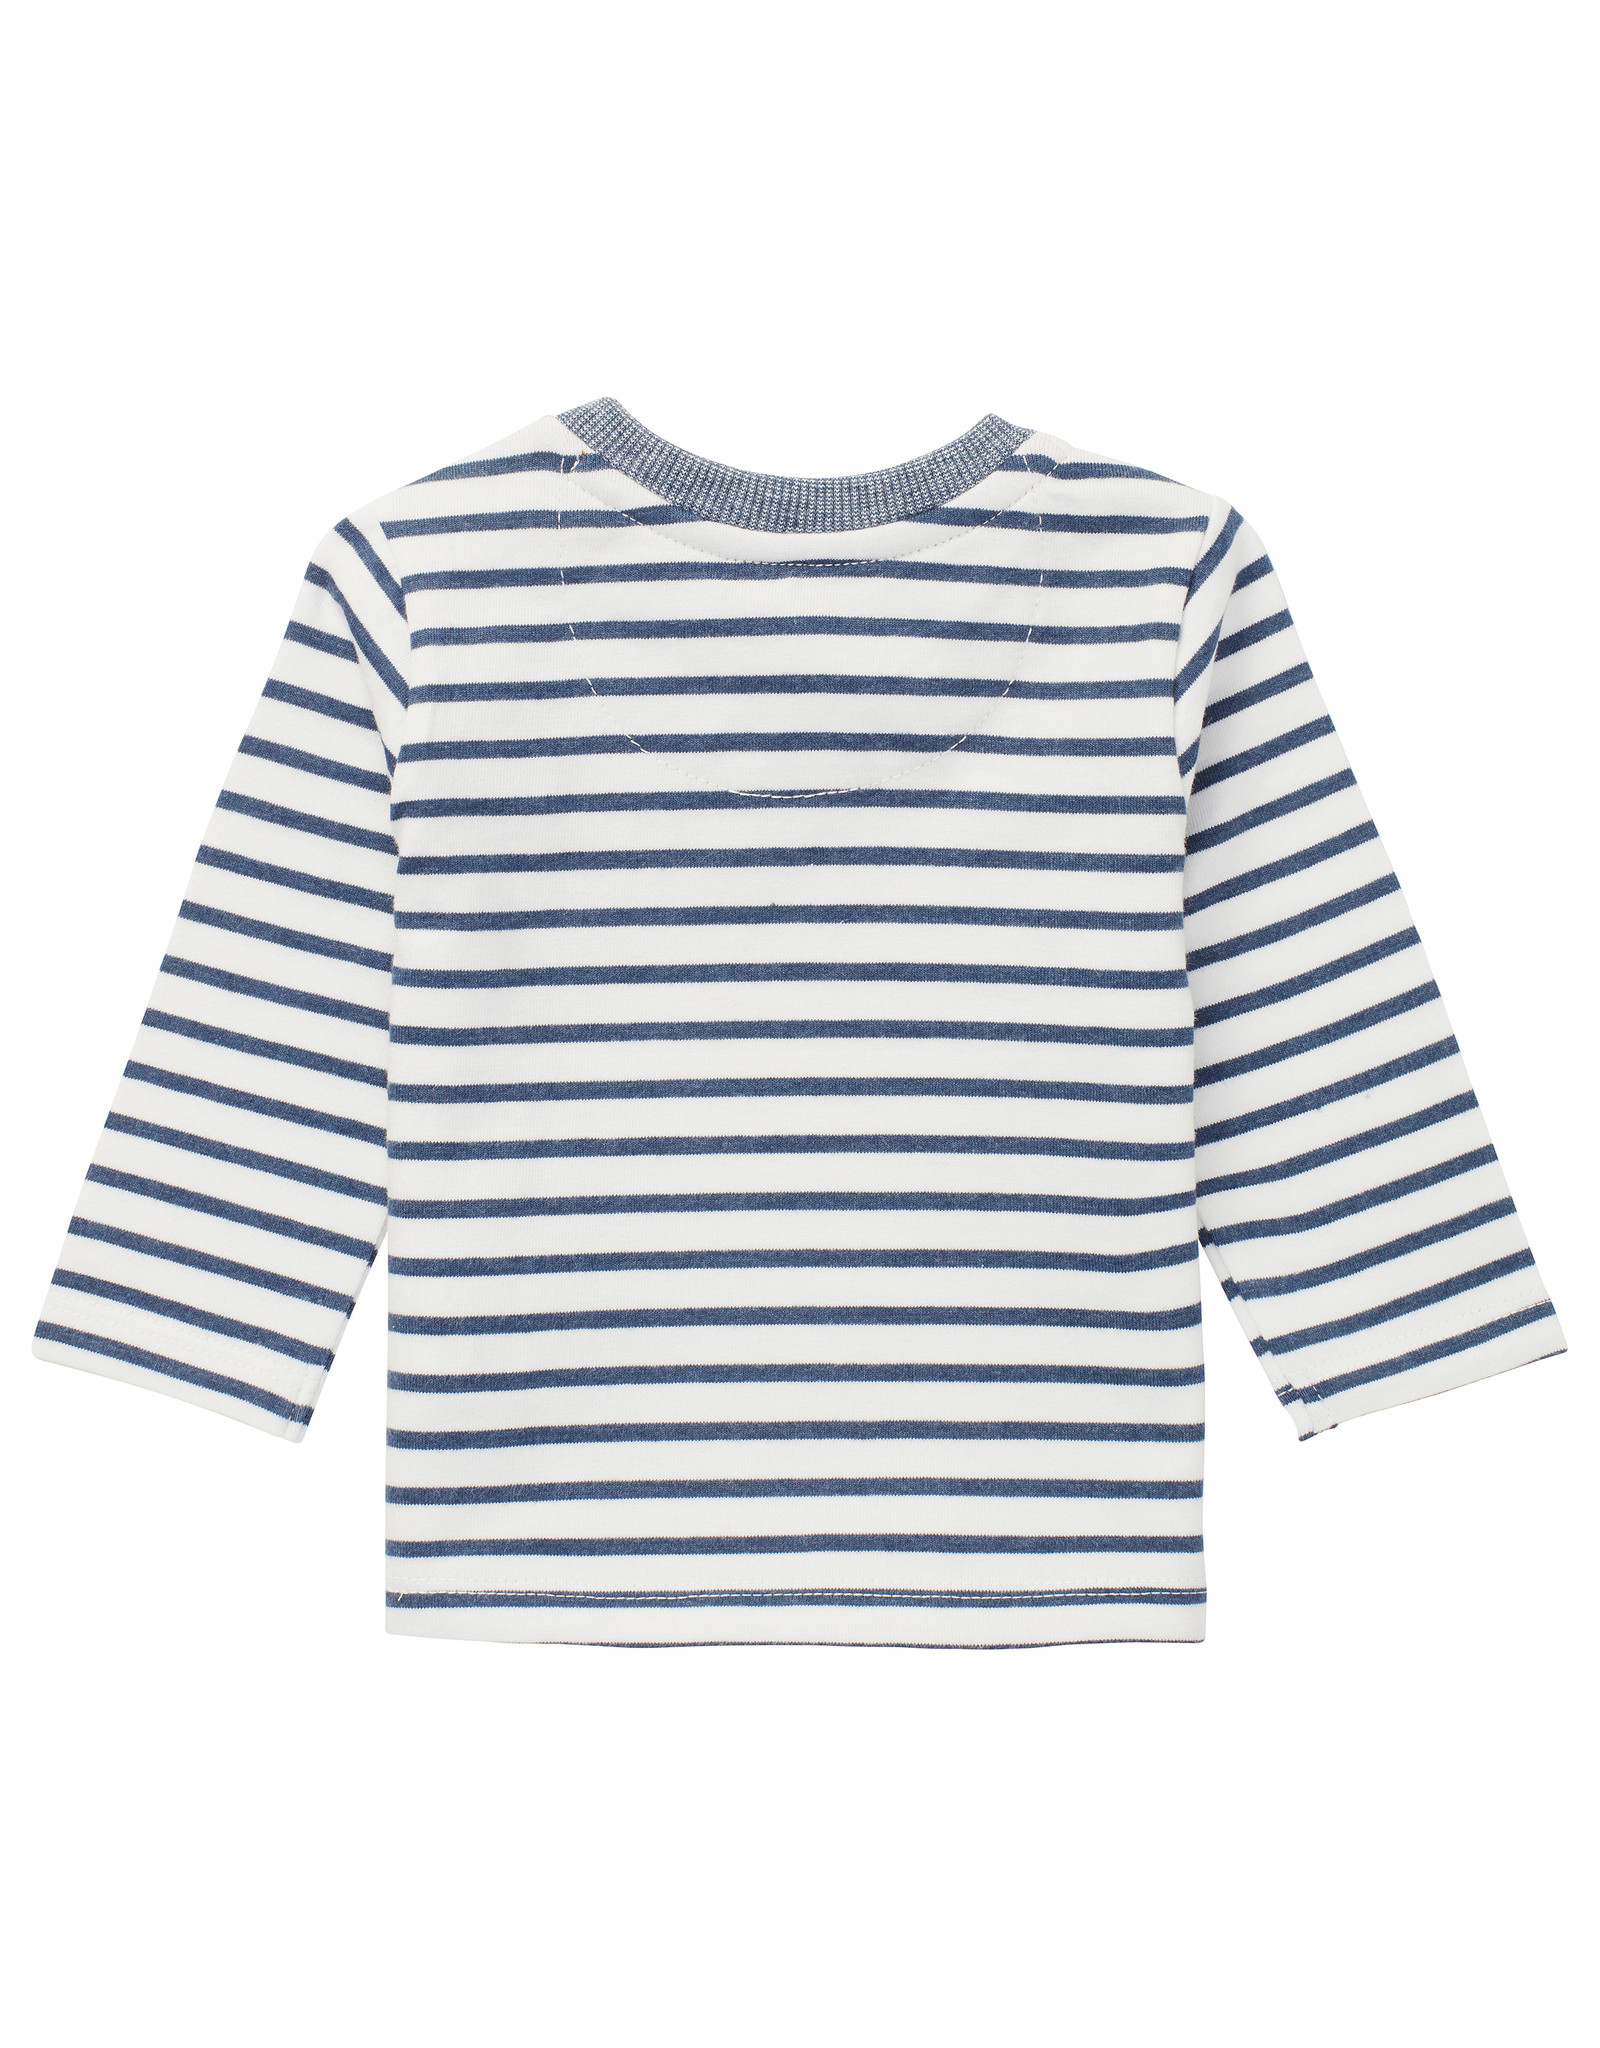 Noppies B T-shirt LS Tholen, Ensign Blue